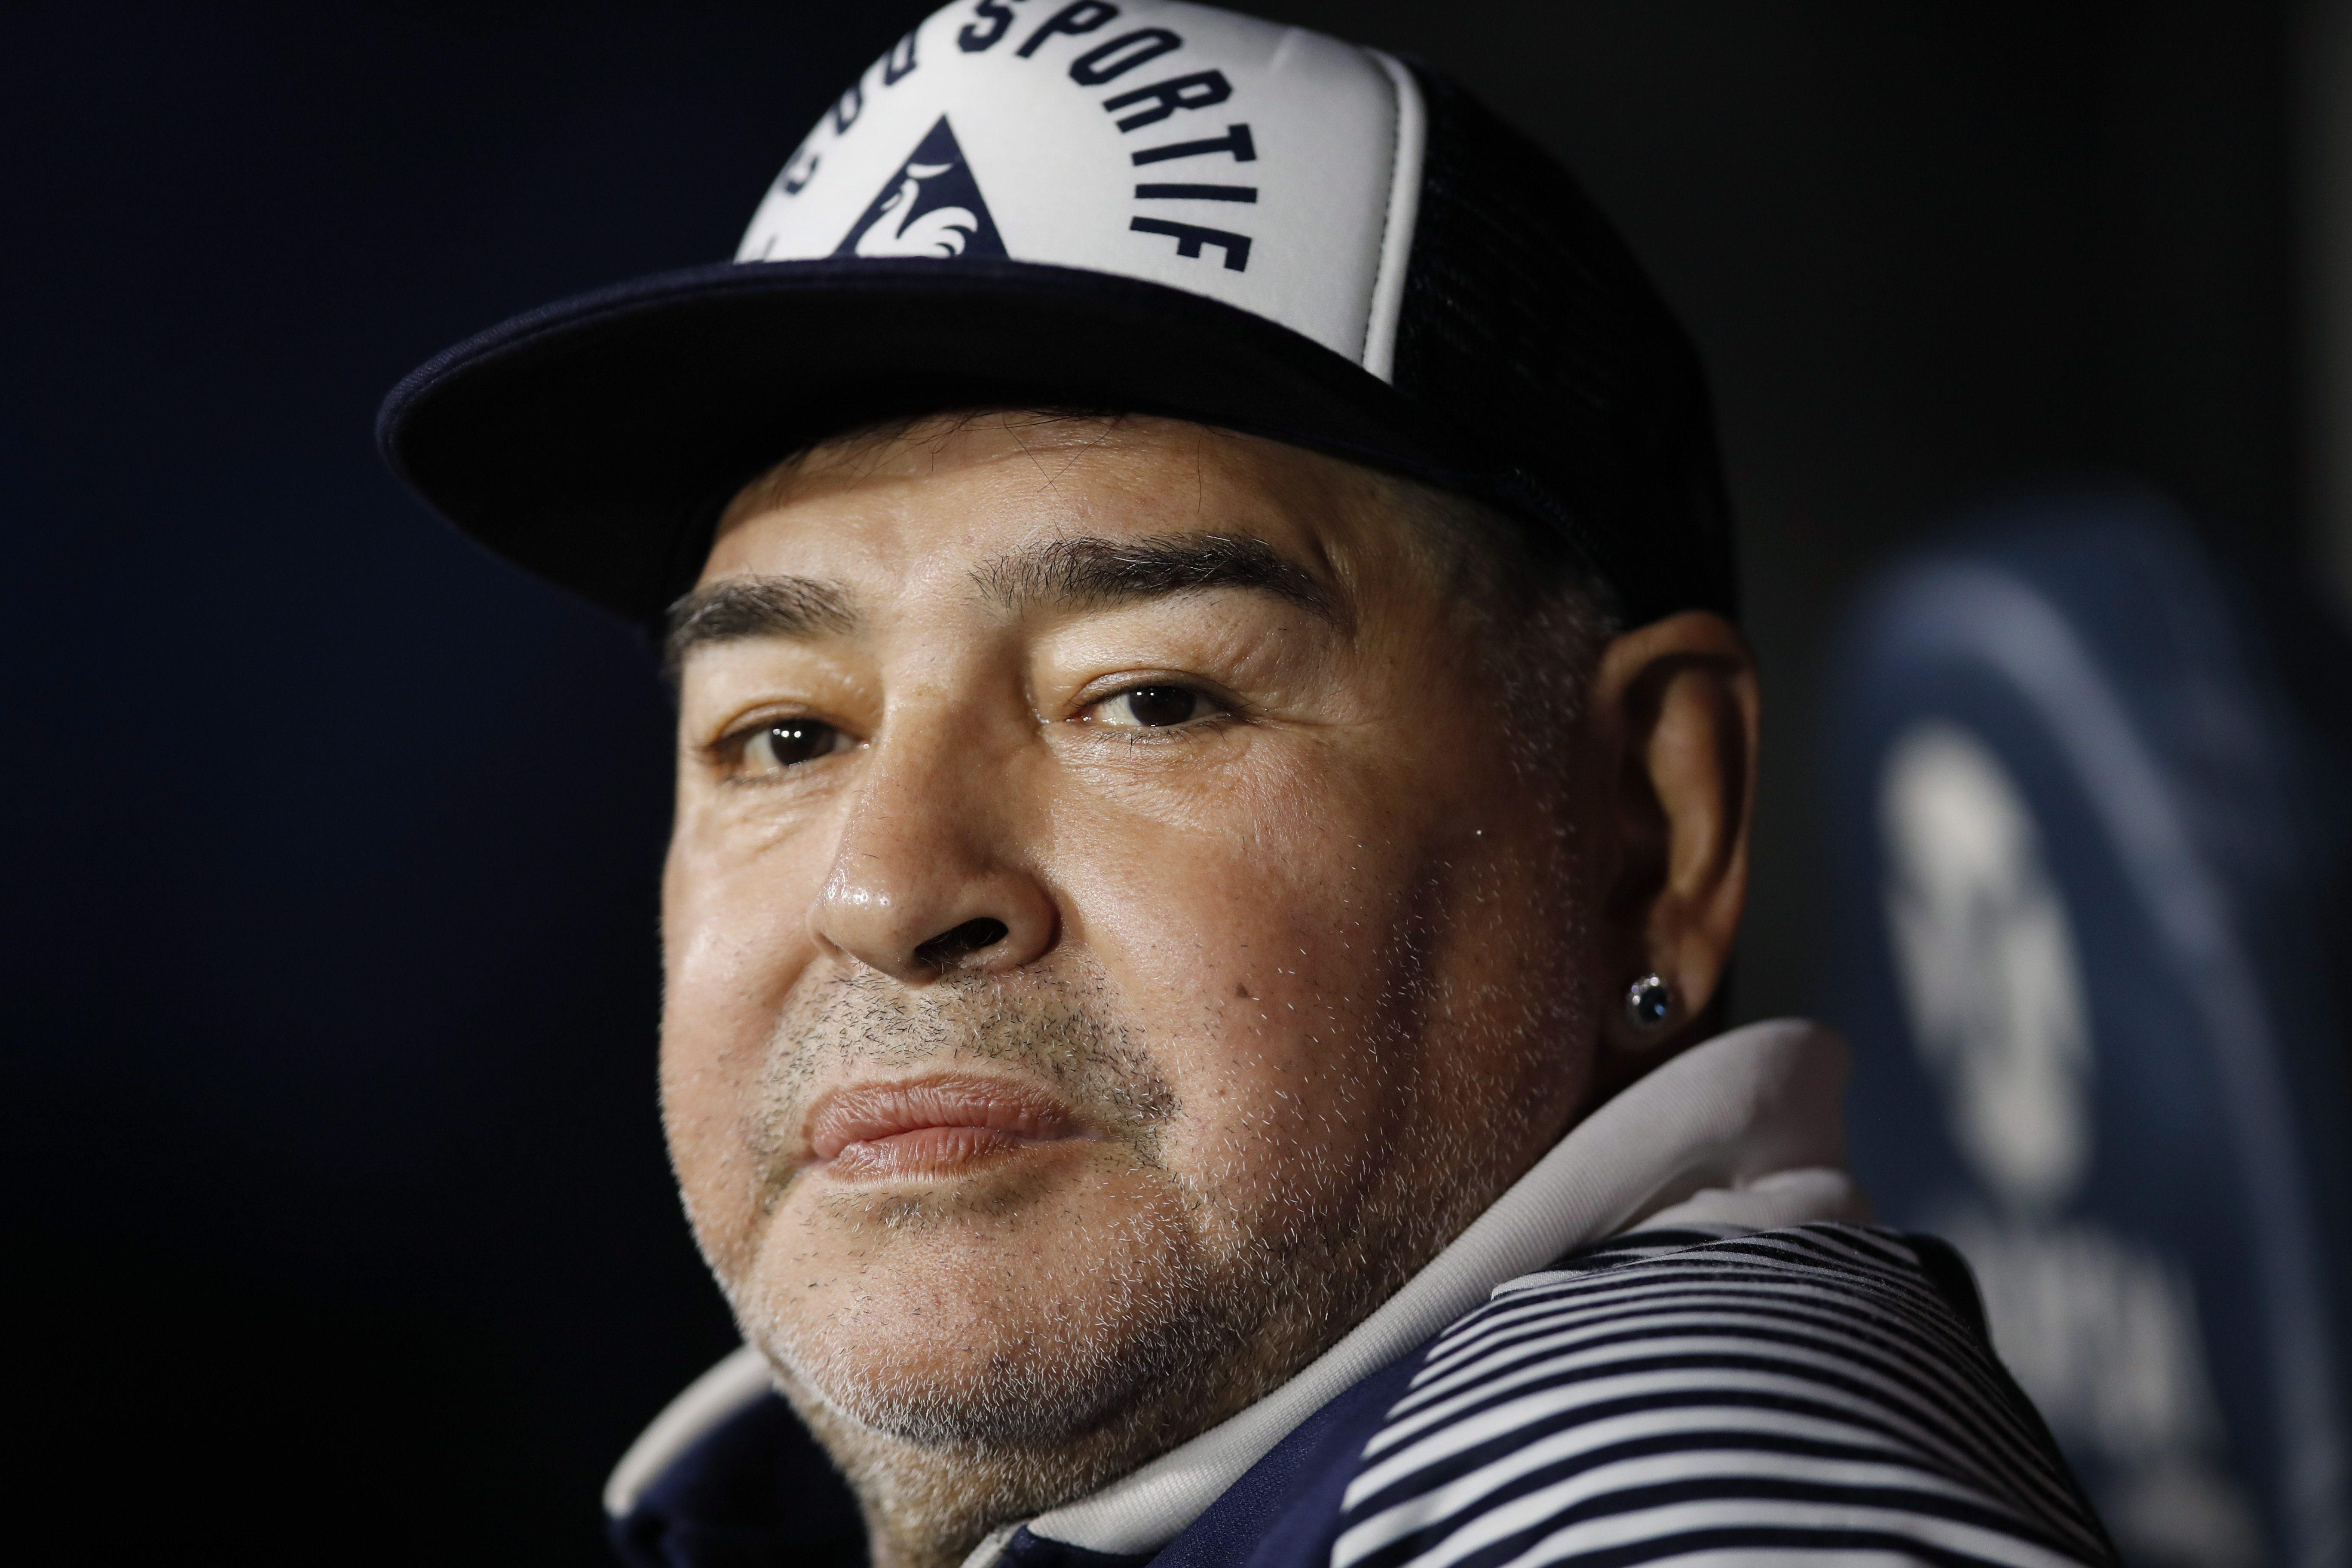 Maradona, Argentina soccer legend, dies of heart attack: family lawyer